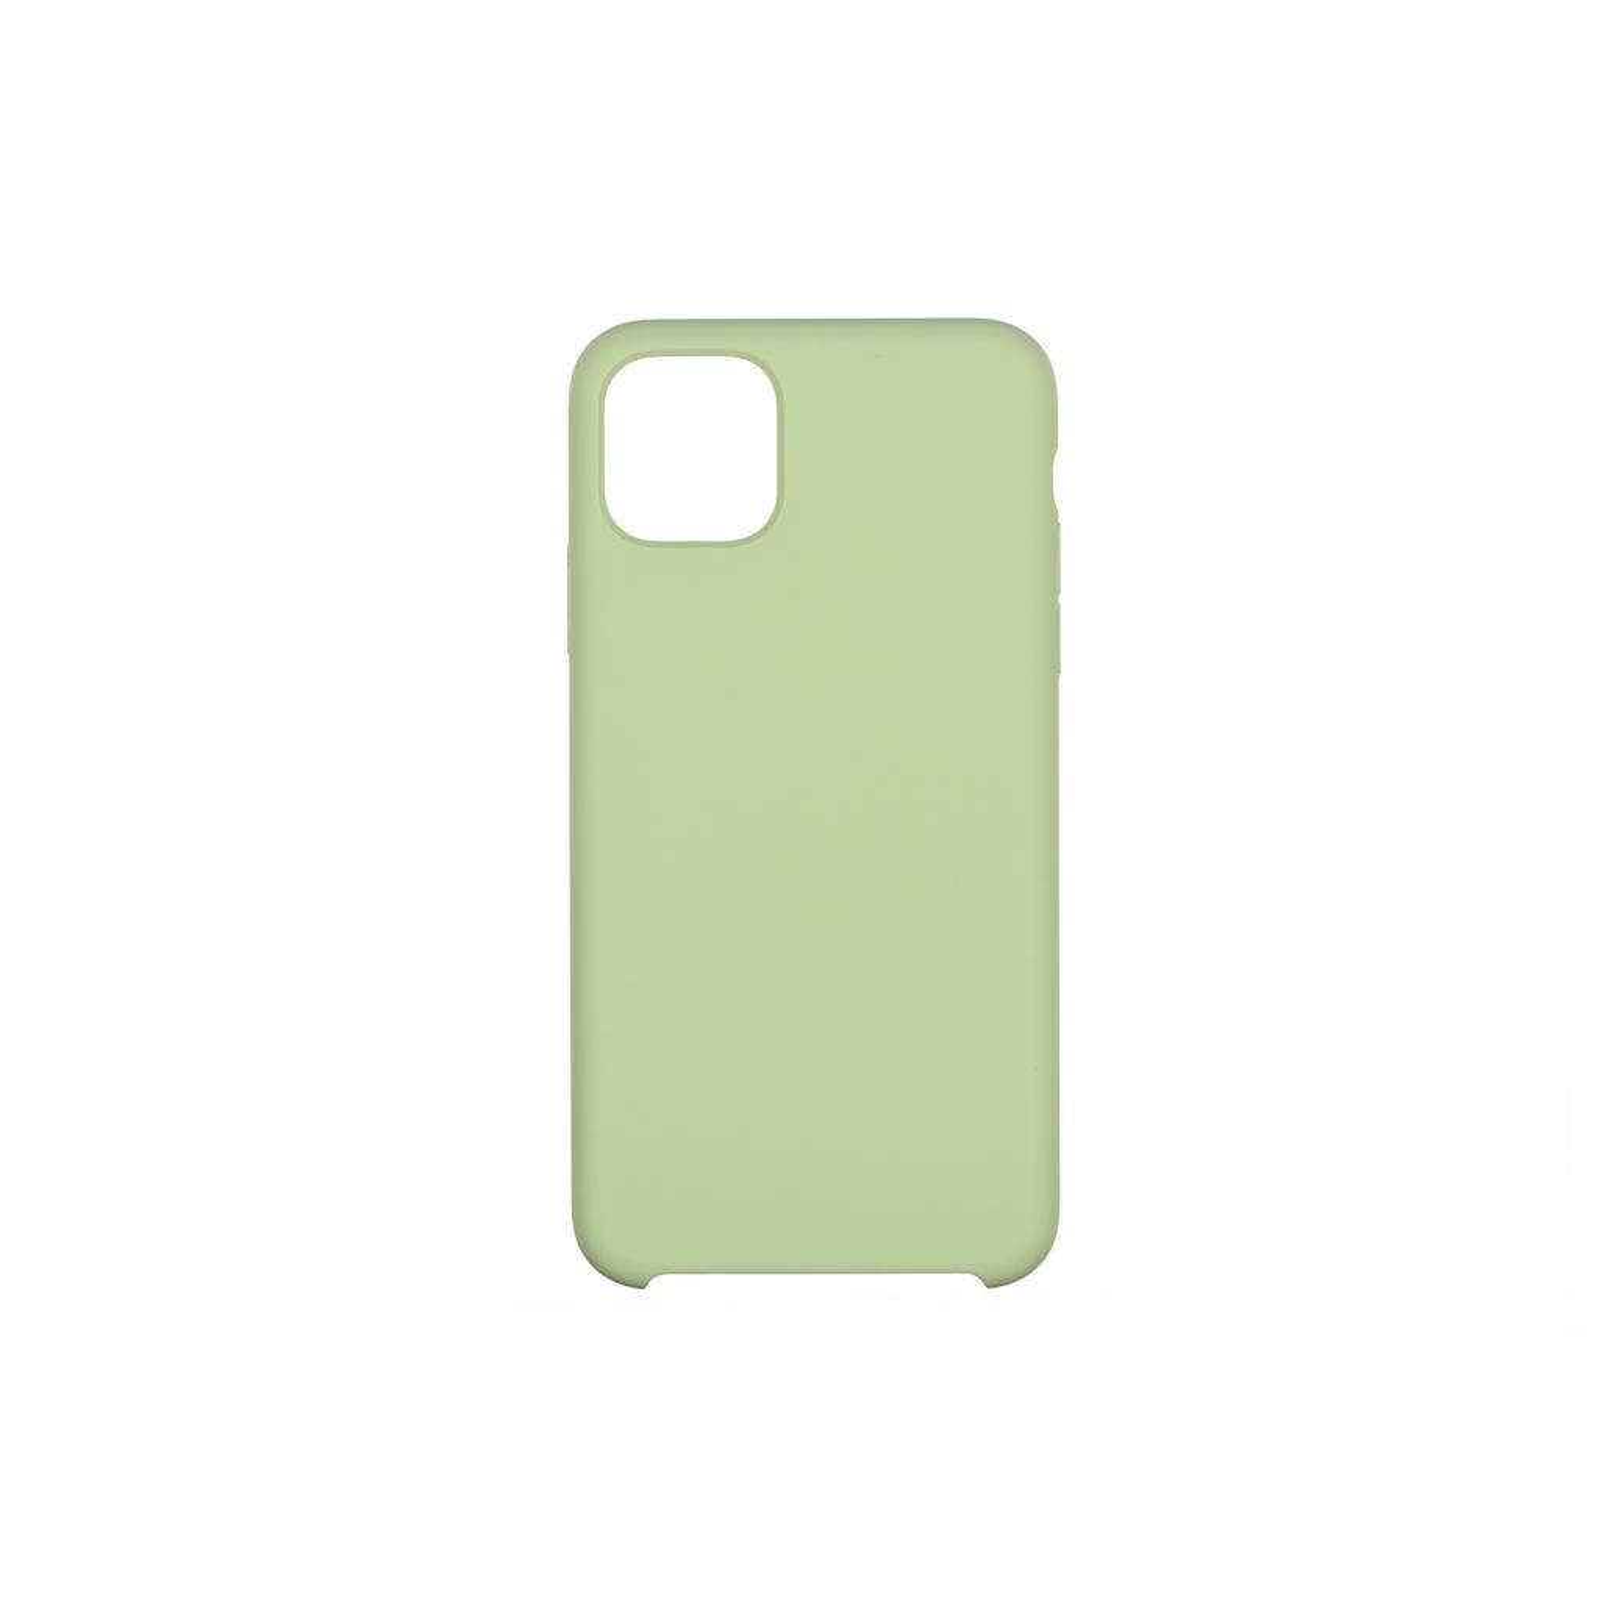 "Чехол для моб. телефона 2E Apple iPhone 11 (6.1""), Liquid Silicone, Light Green (2E-IPH-11-OCLS-LG)"